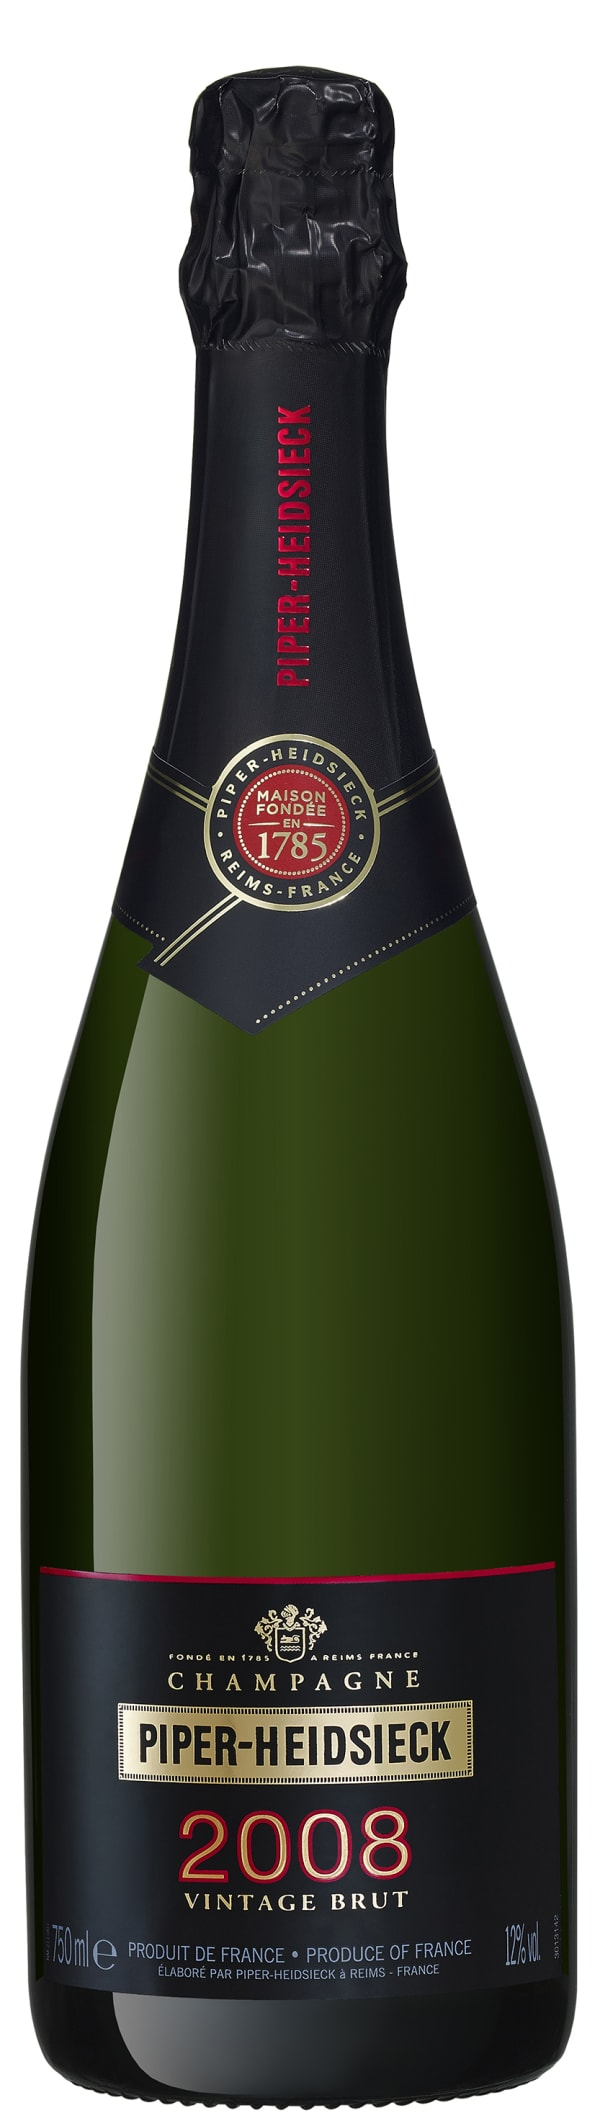 Piper-Heidsieck Vintage Champagne Brut 2008